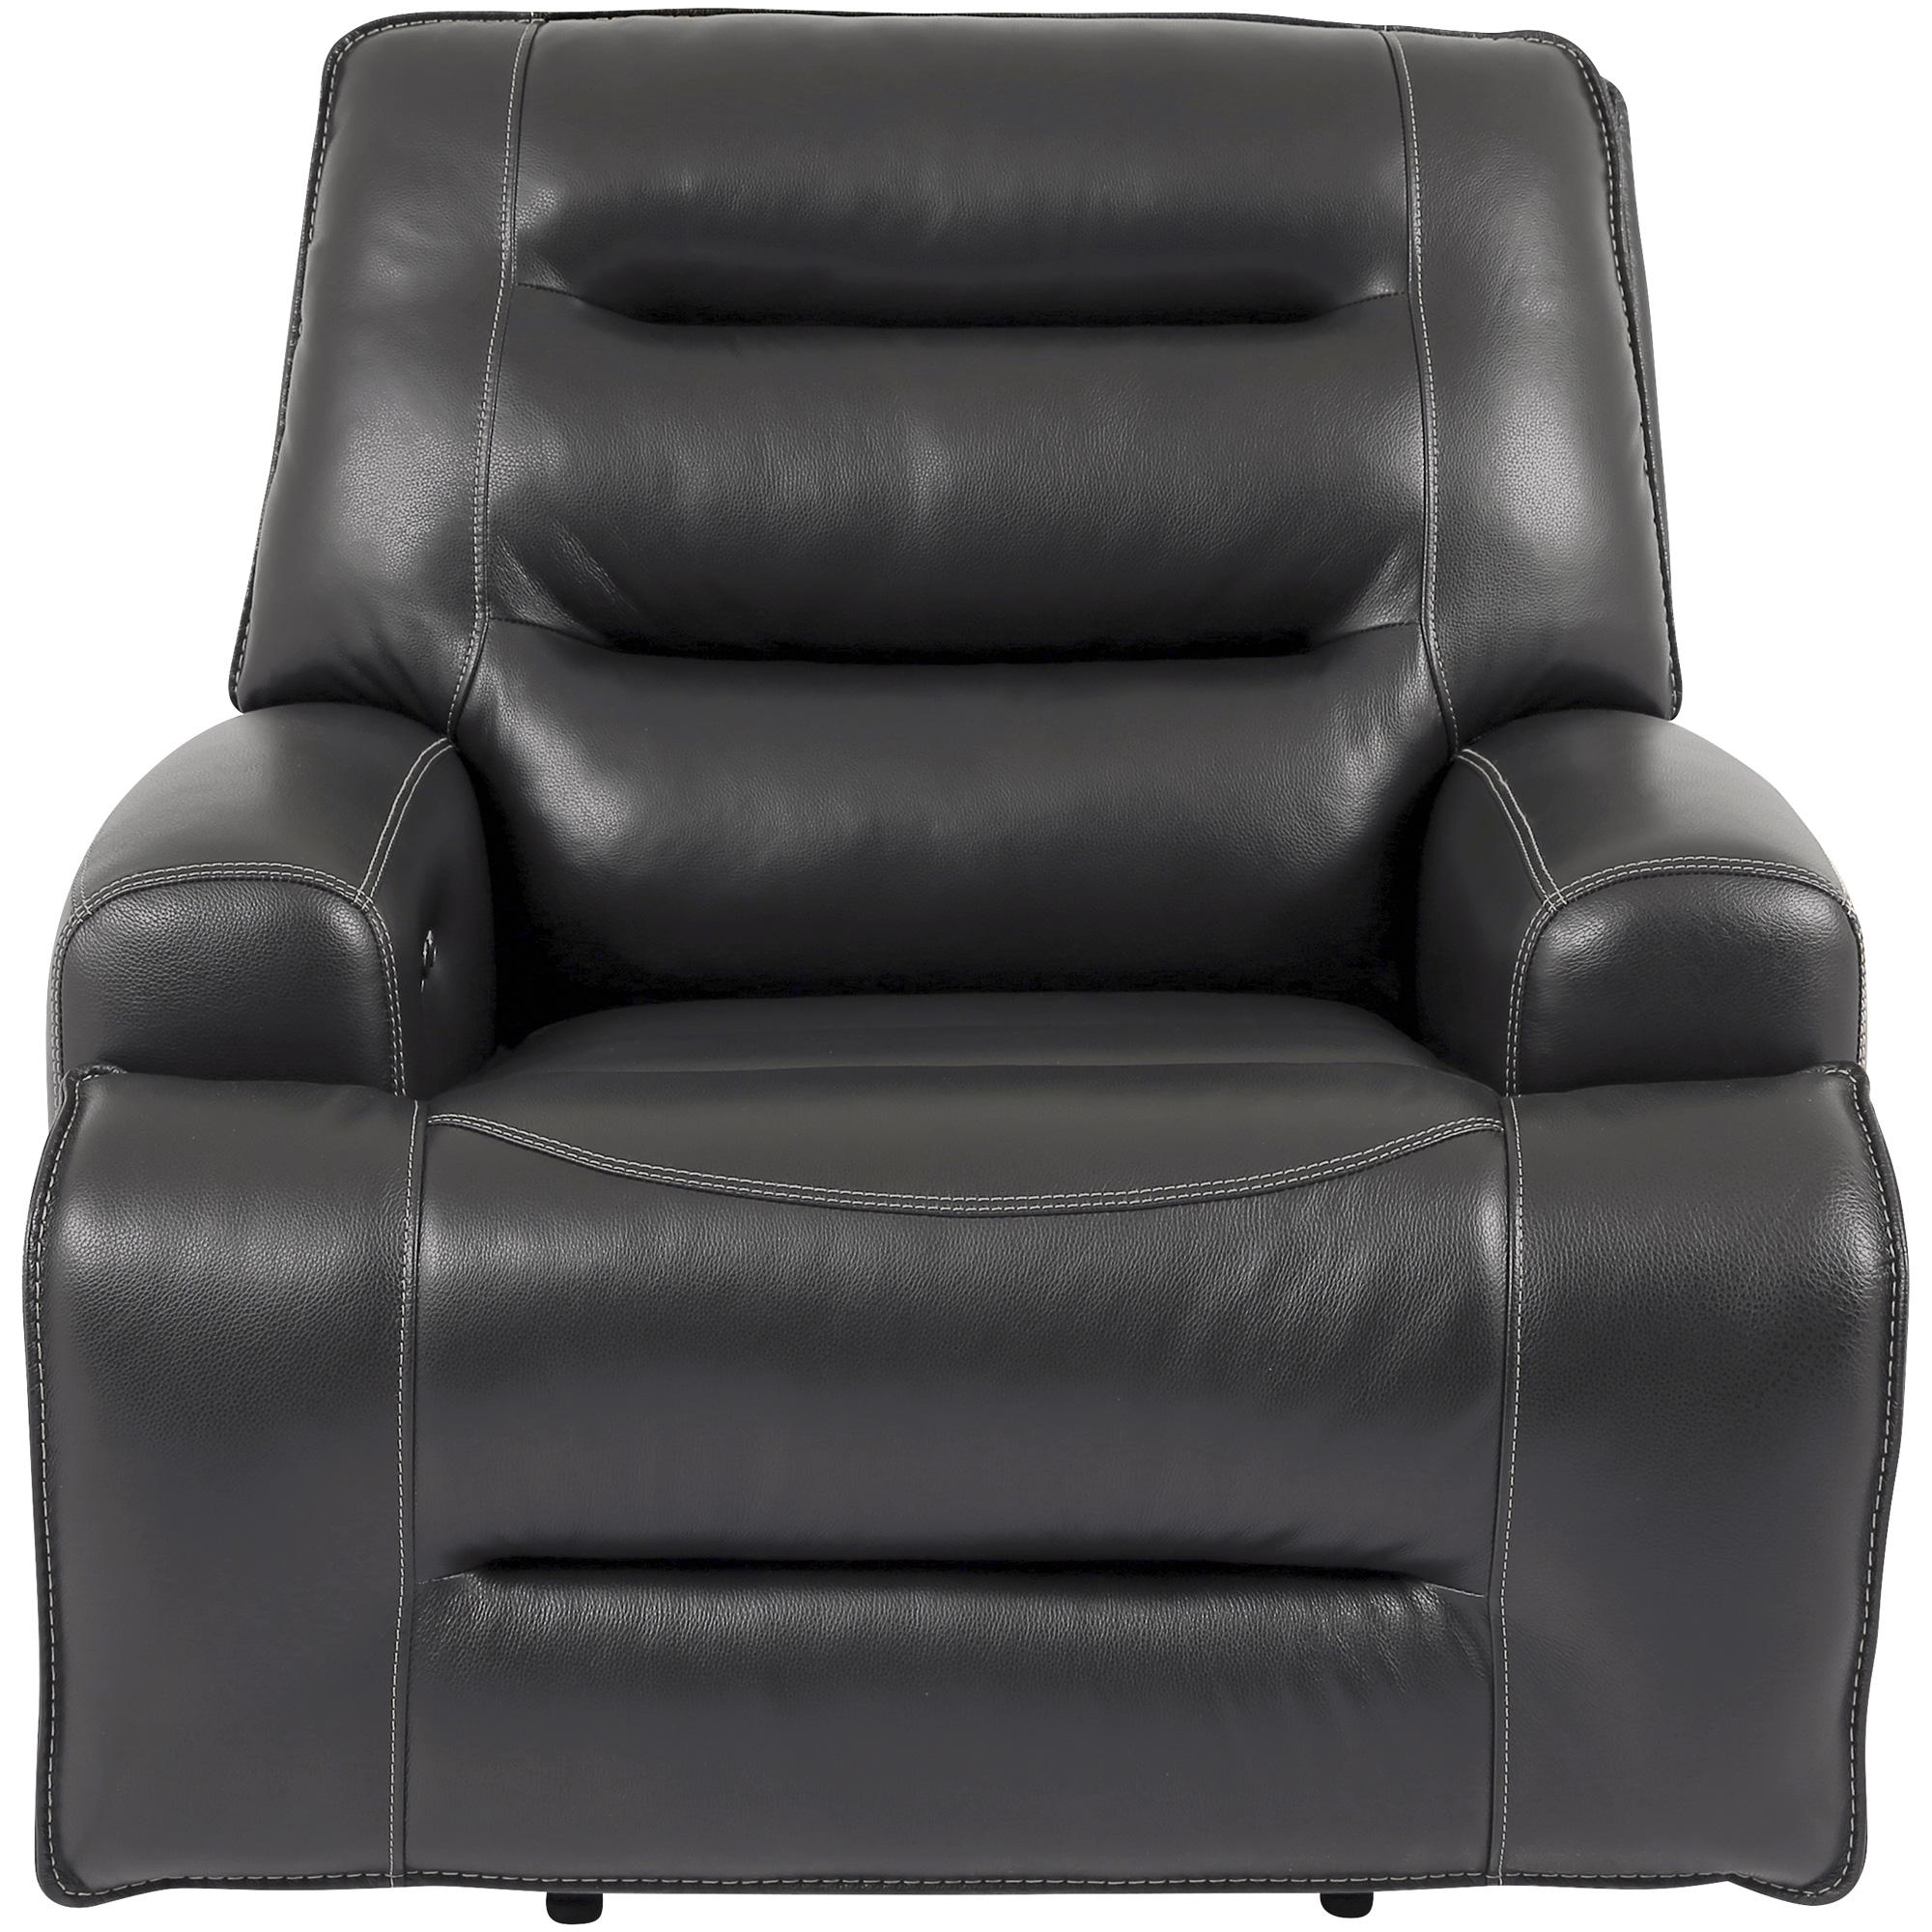 Wah Cheers | Triton Gray Power+ Recliner Chair